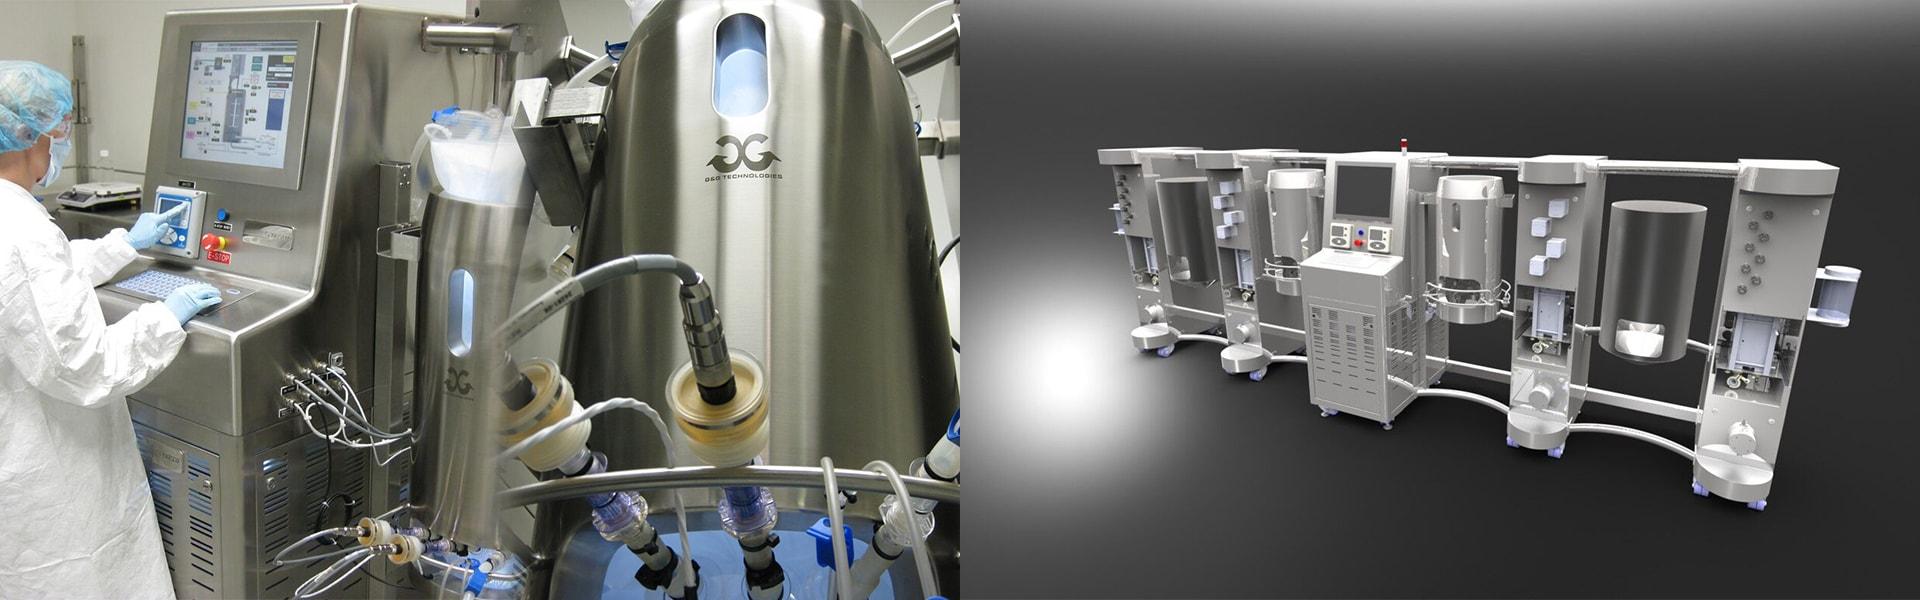 OmniStream Bioreactors